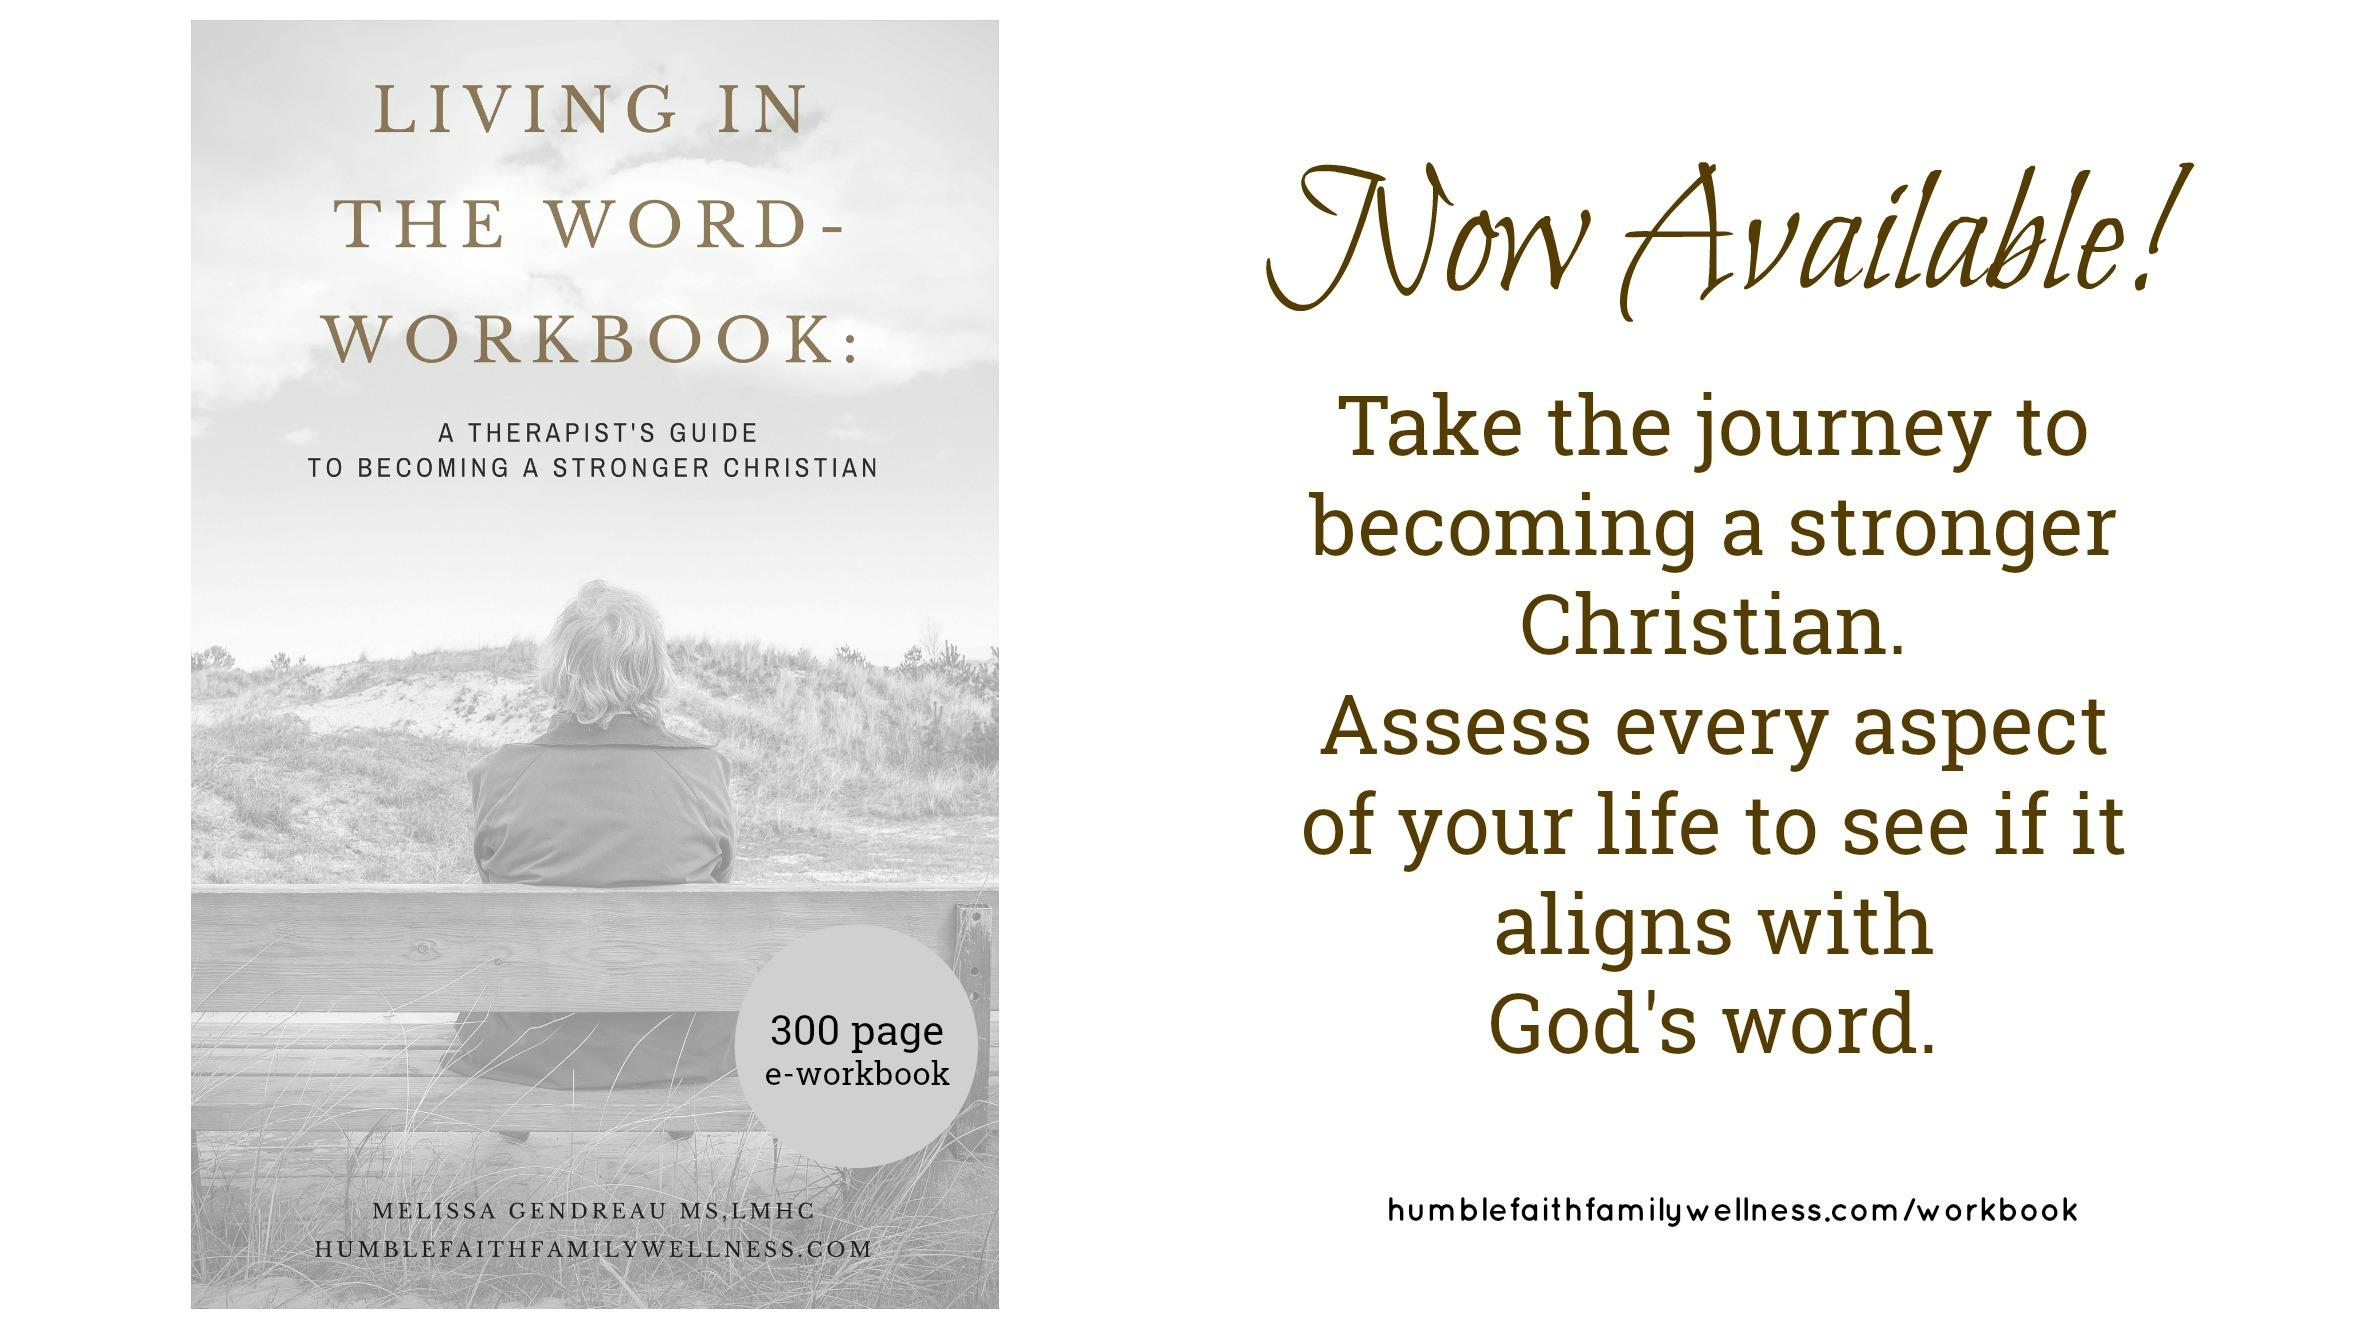 Living in the word eworkbook humble faith family wellness solutioingenieria Choice Image